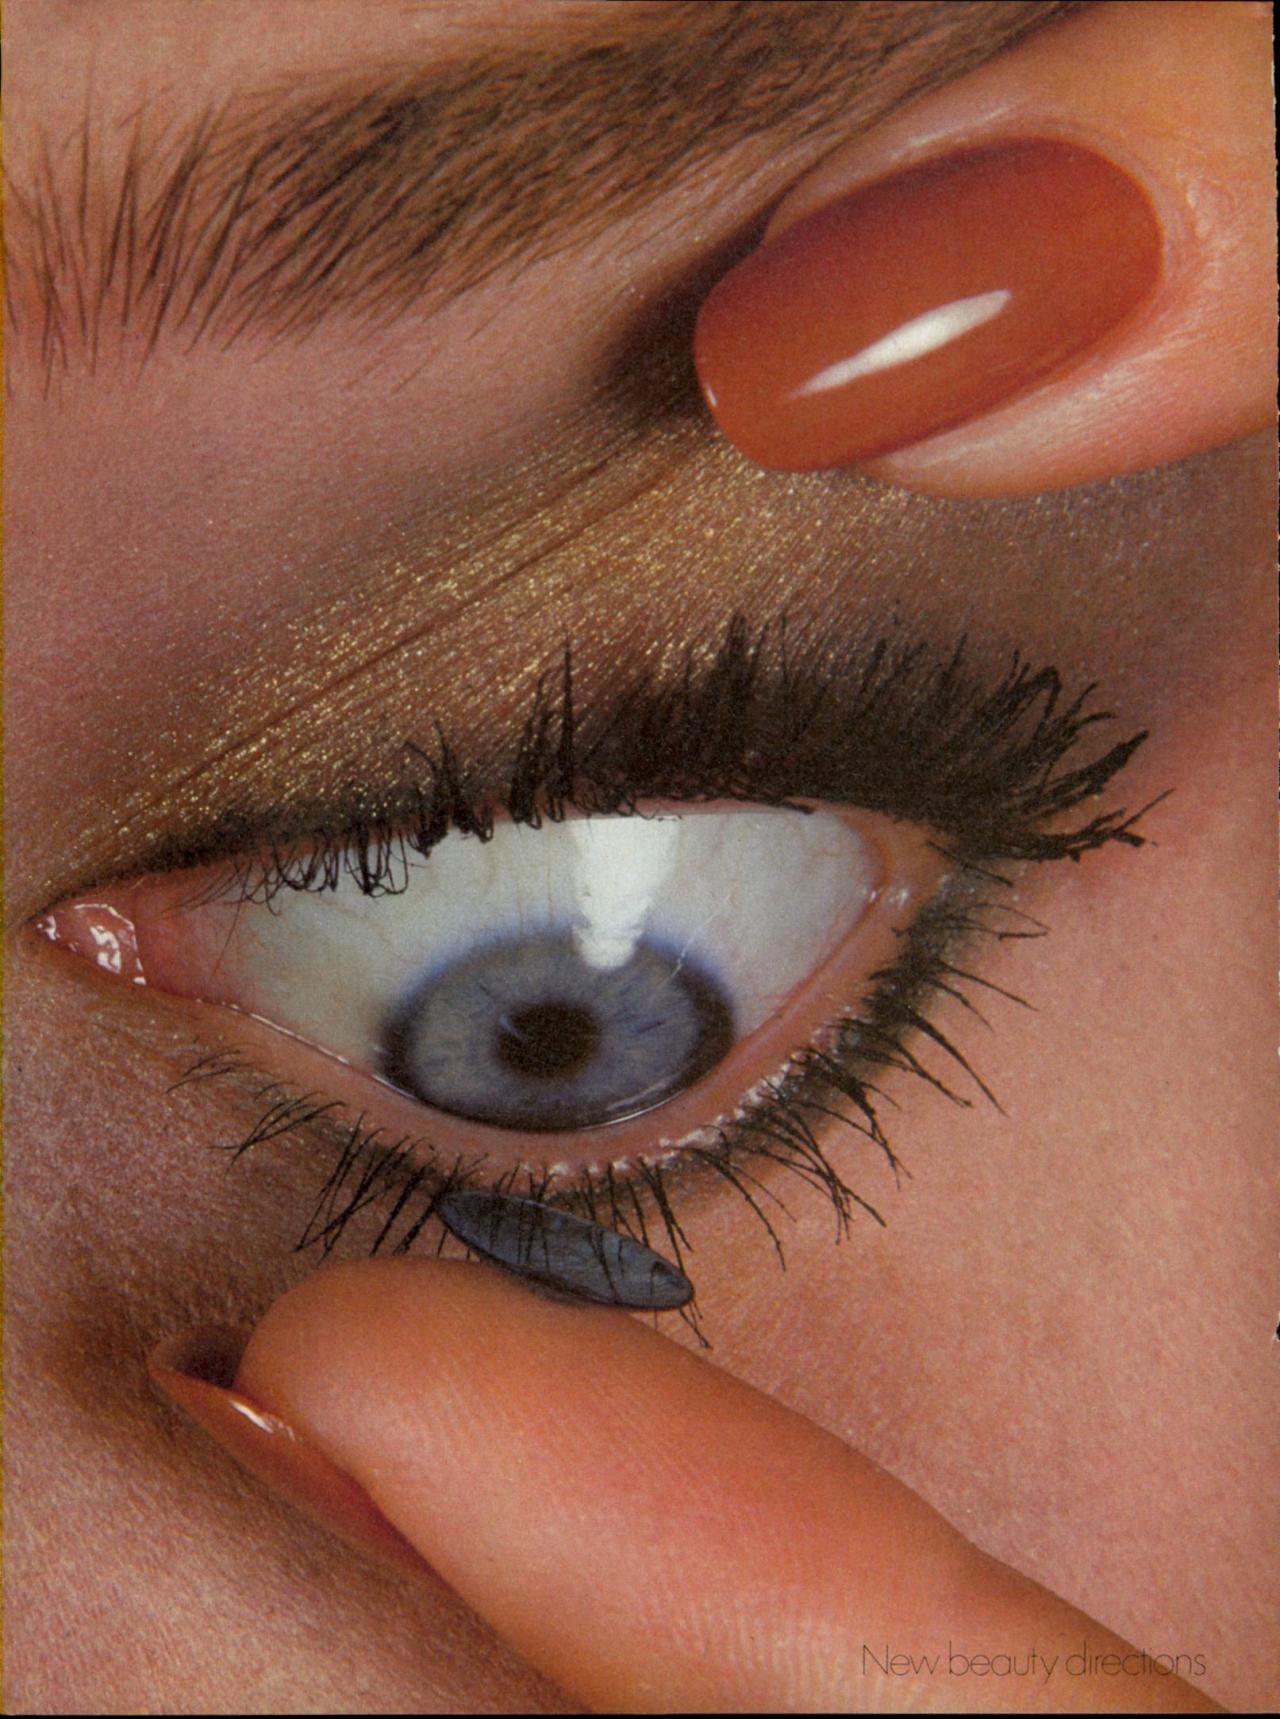 "Kelly LeBrock in ""New Direction in Beauty"" by Irving Penn"